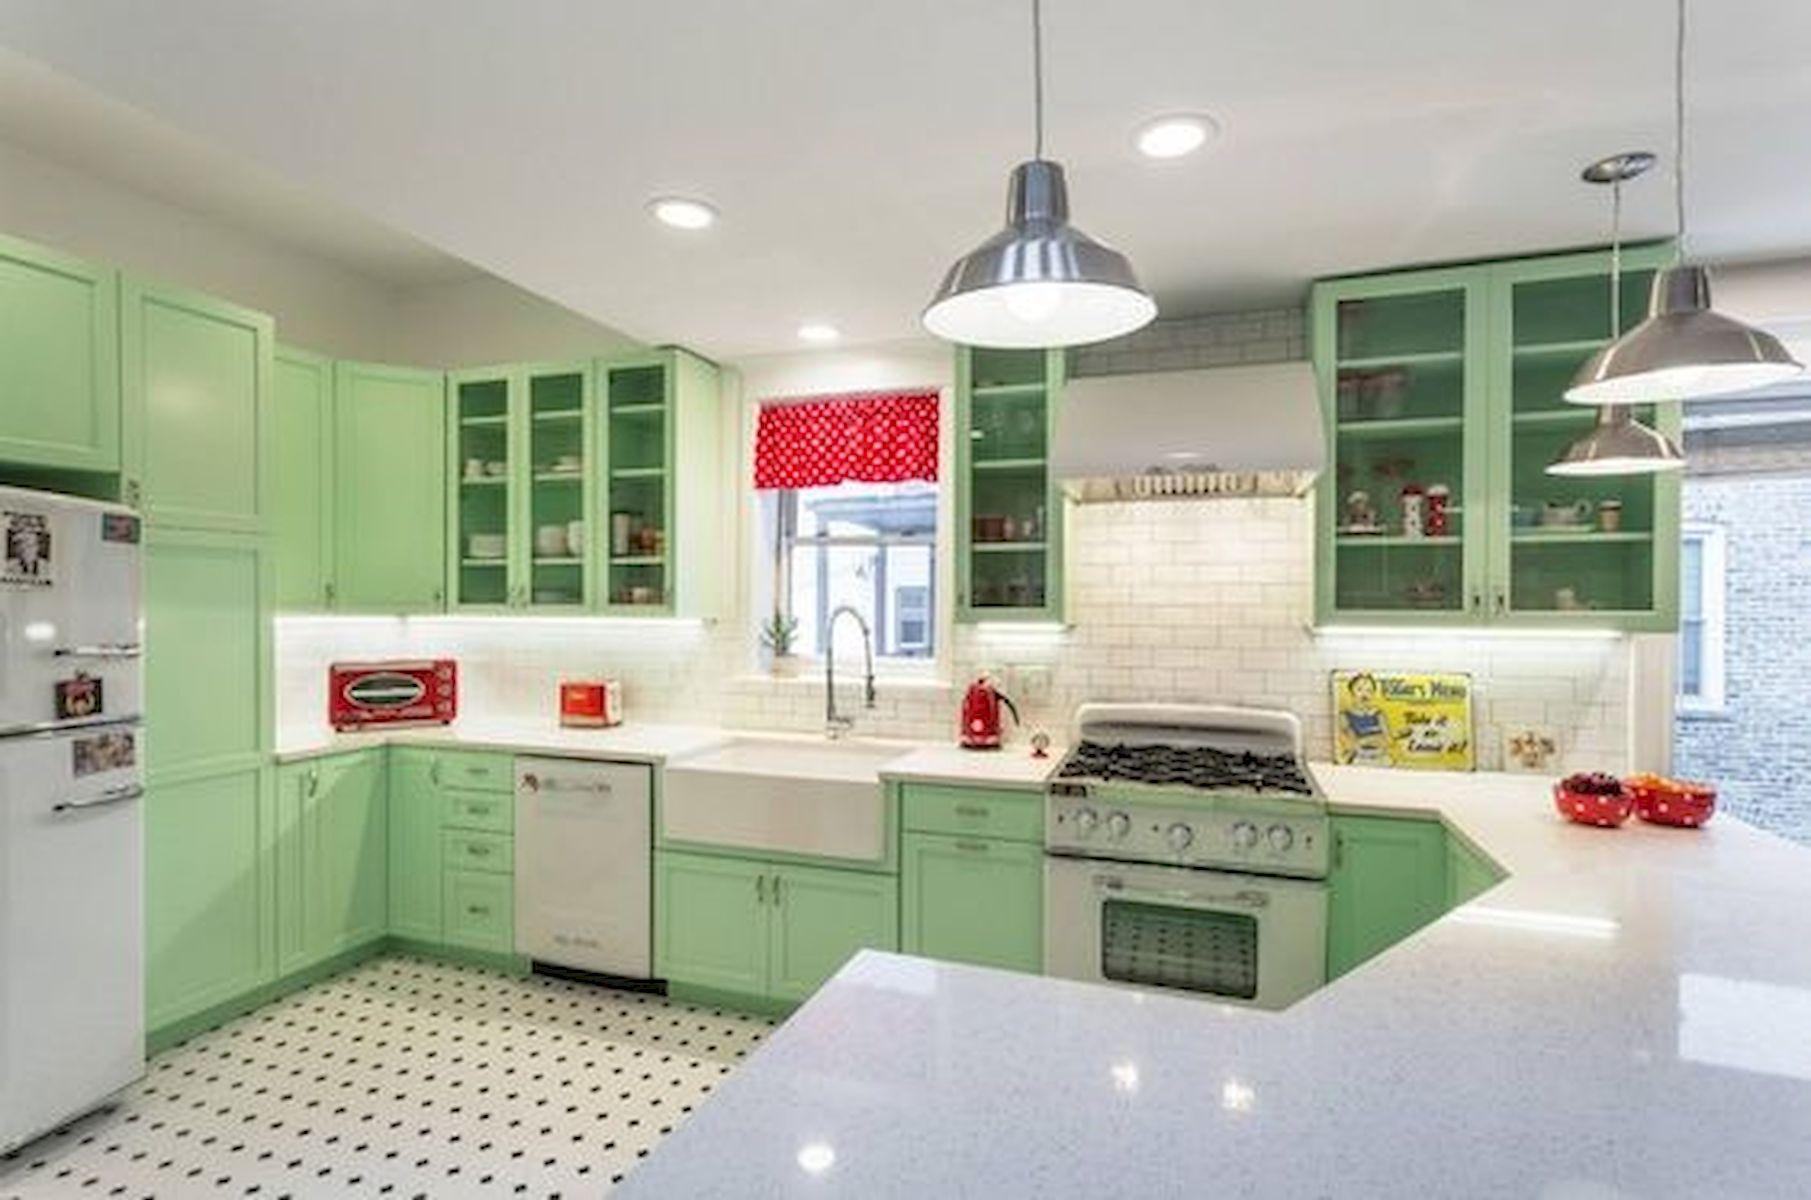 40 Best Tile Flooring Designs Ideas For Modern Kitchen (21)